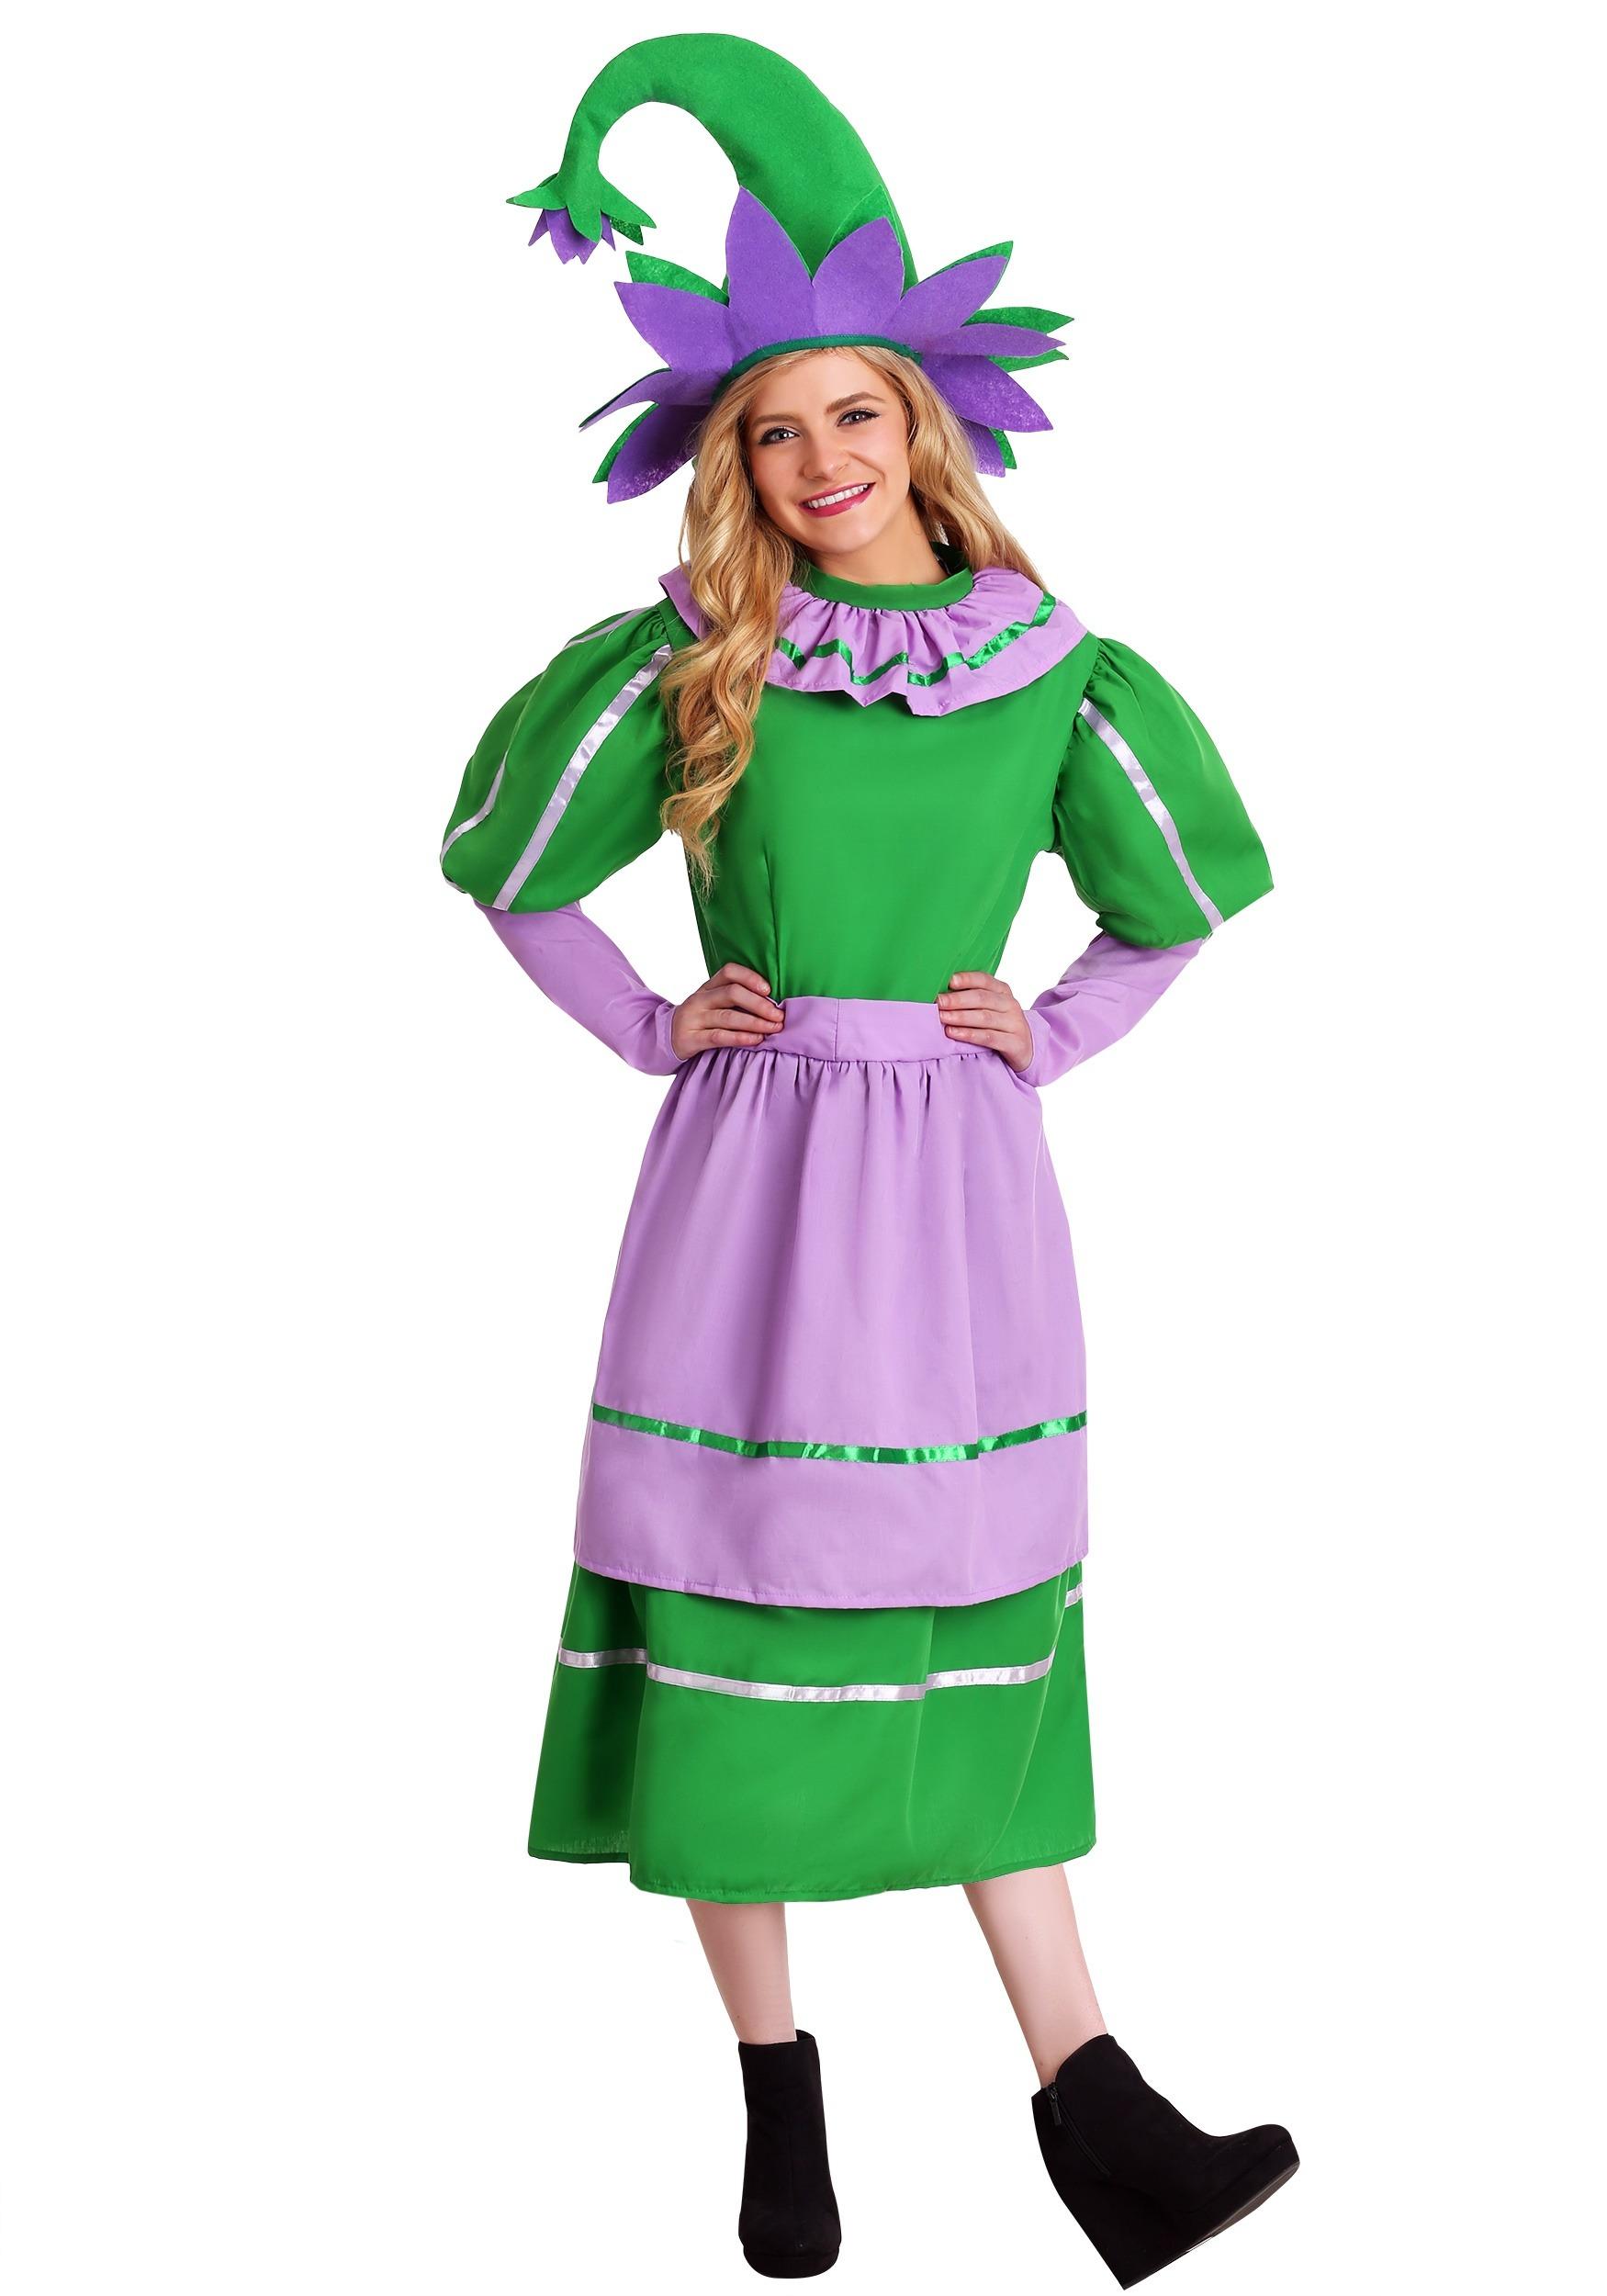 Munchkin Girl Adult Costume